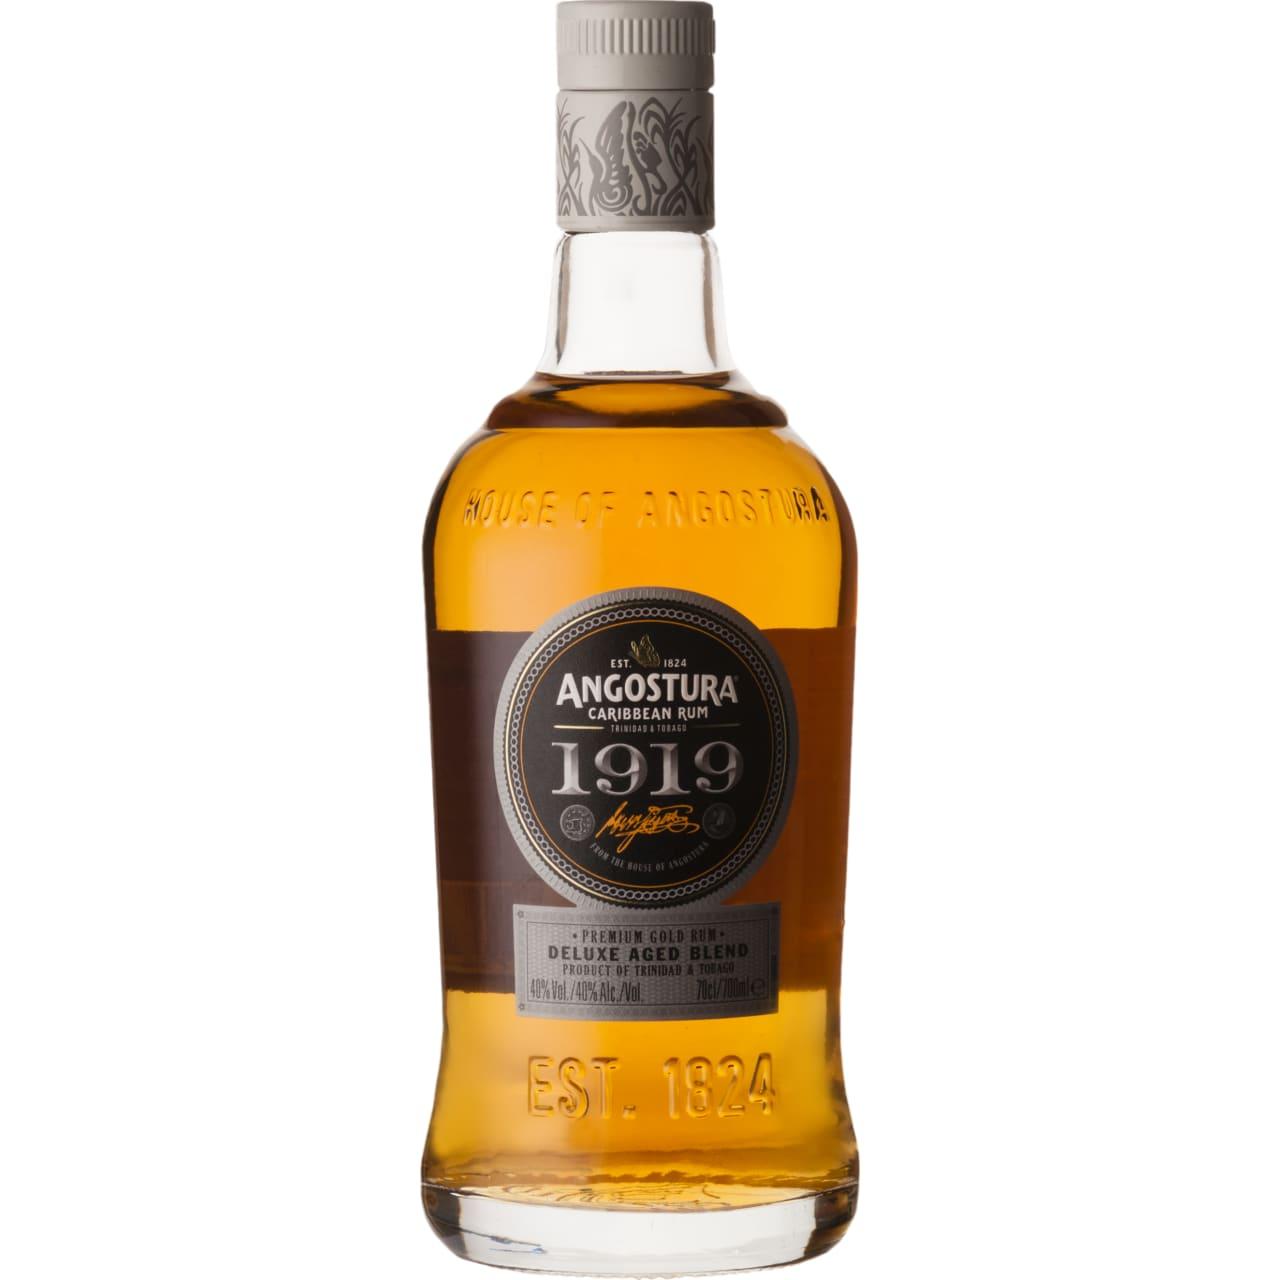 Product Image - Angostura 1919 Aged Rum